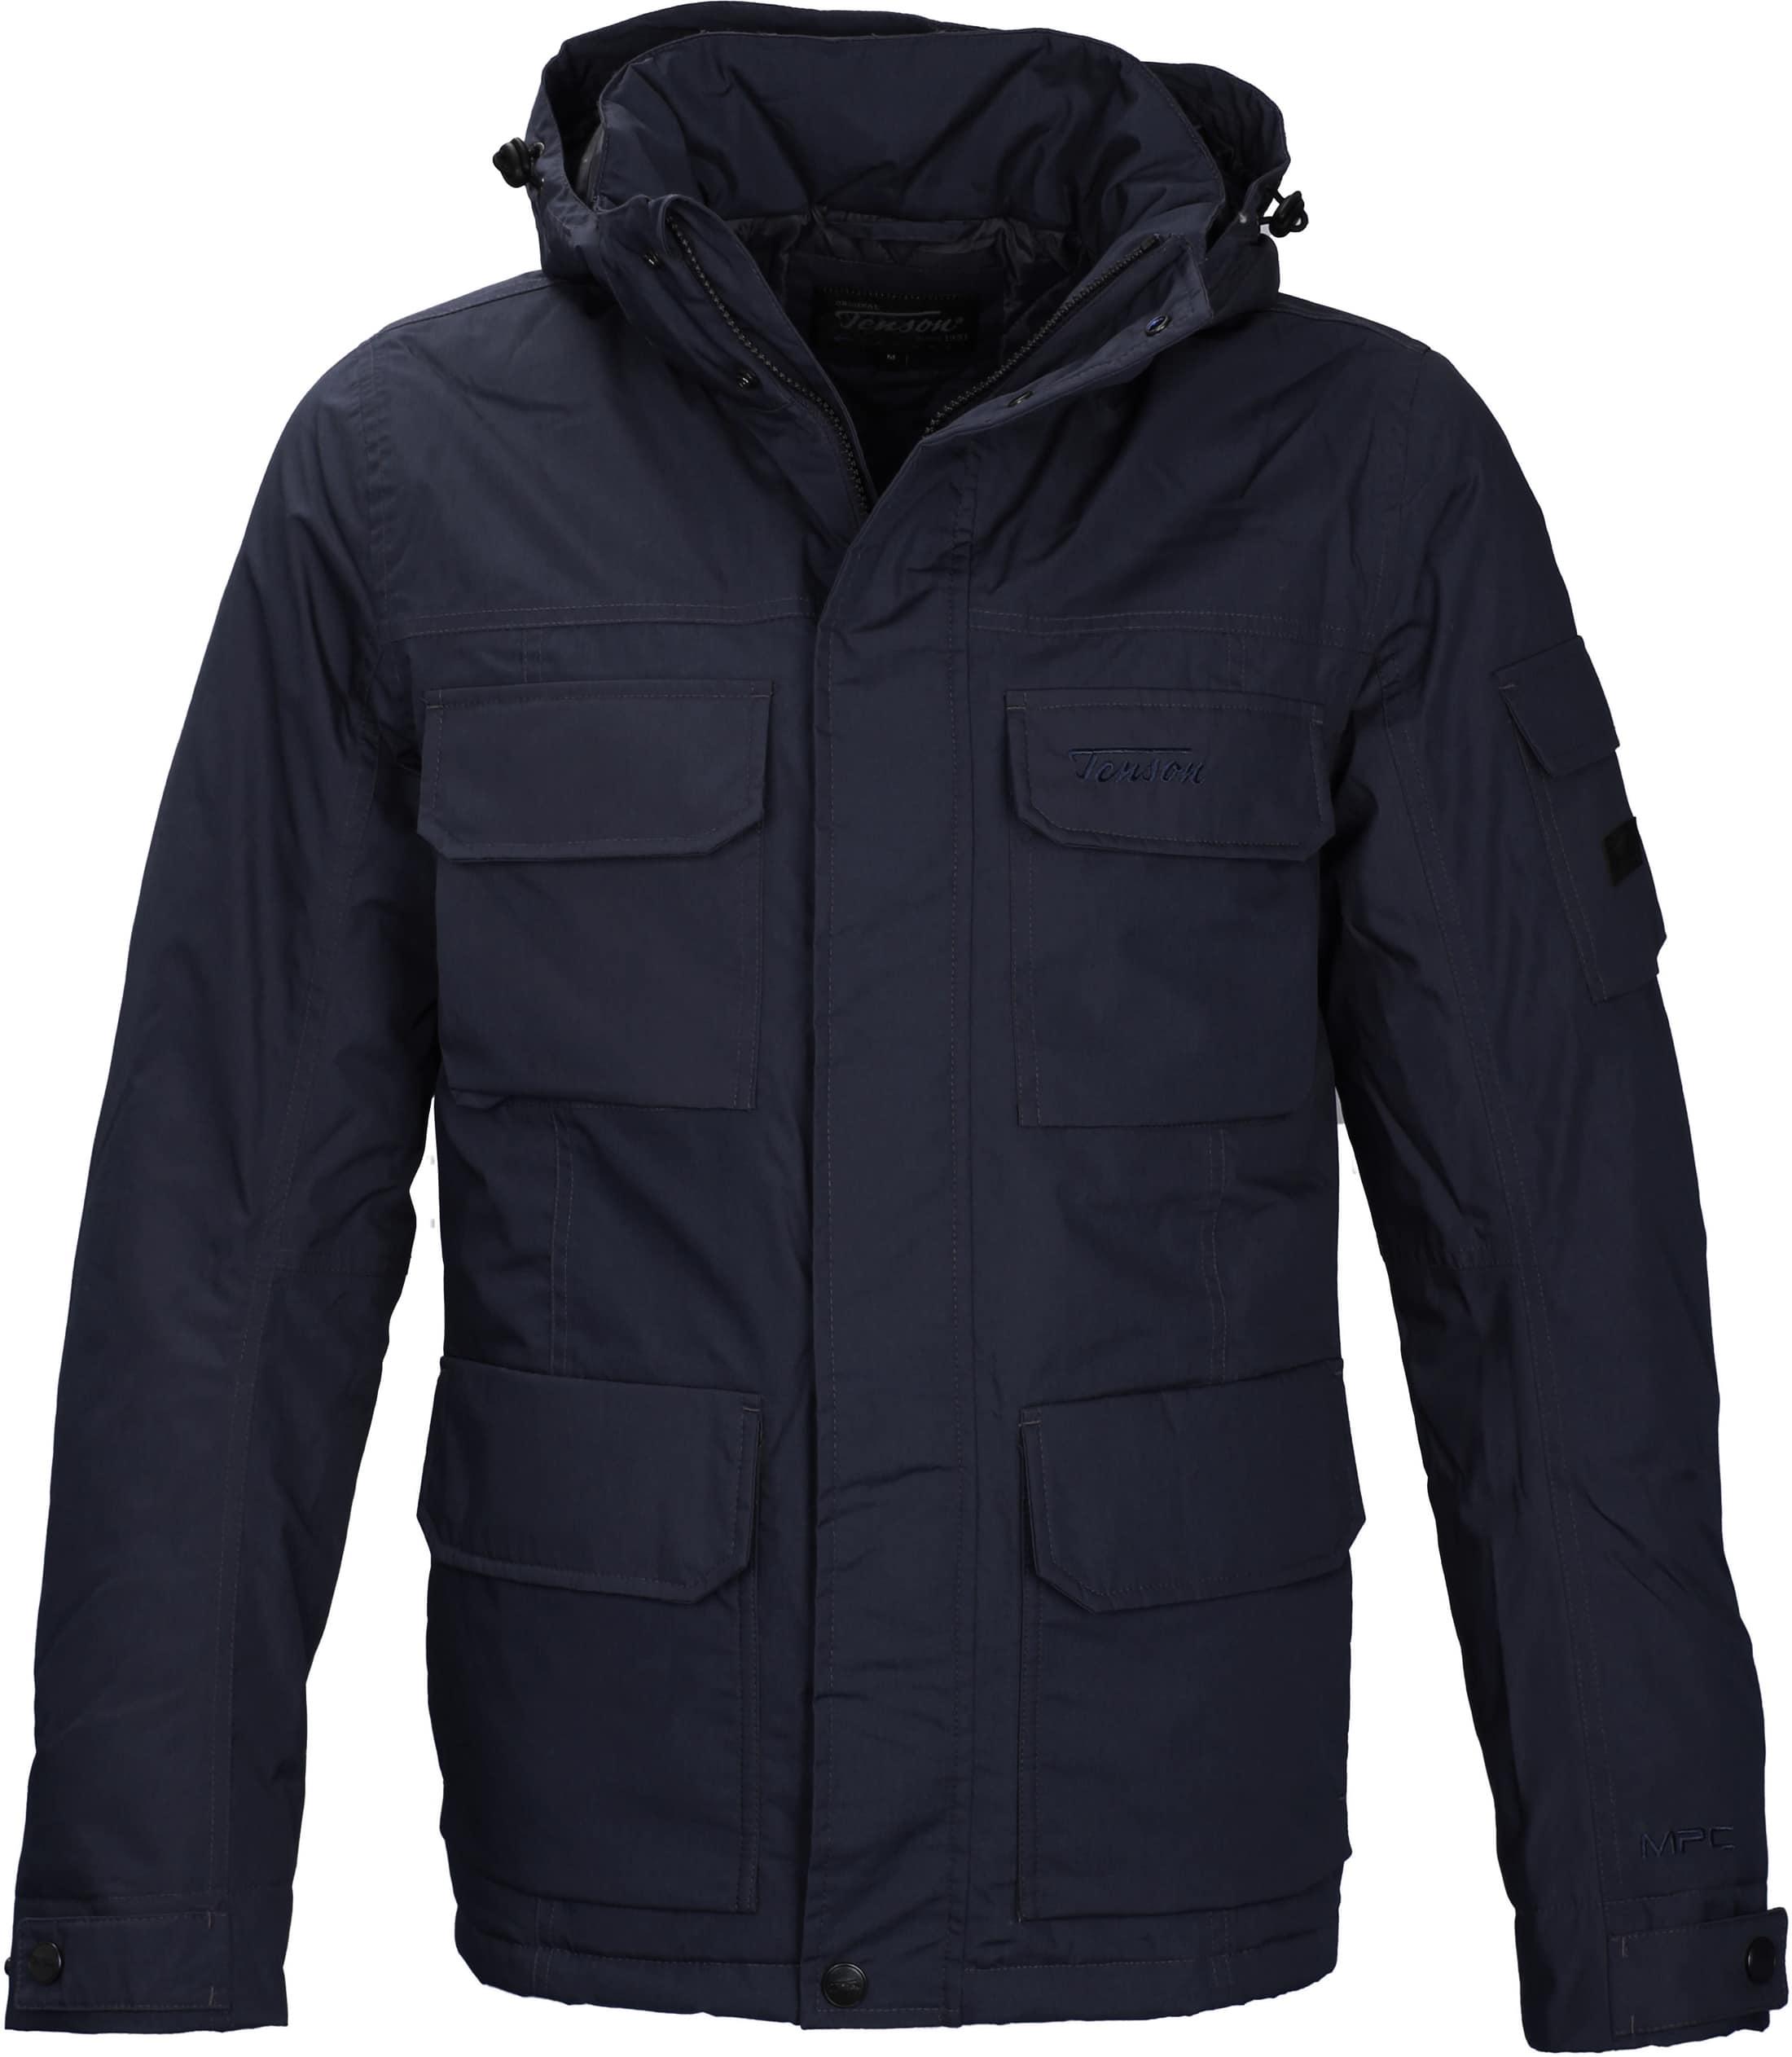 Tenson Danny Jacket Navy 5013941-590 order online  a73096e429